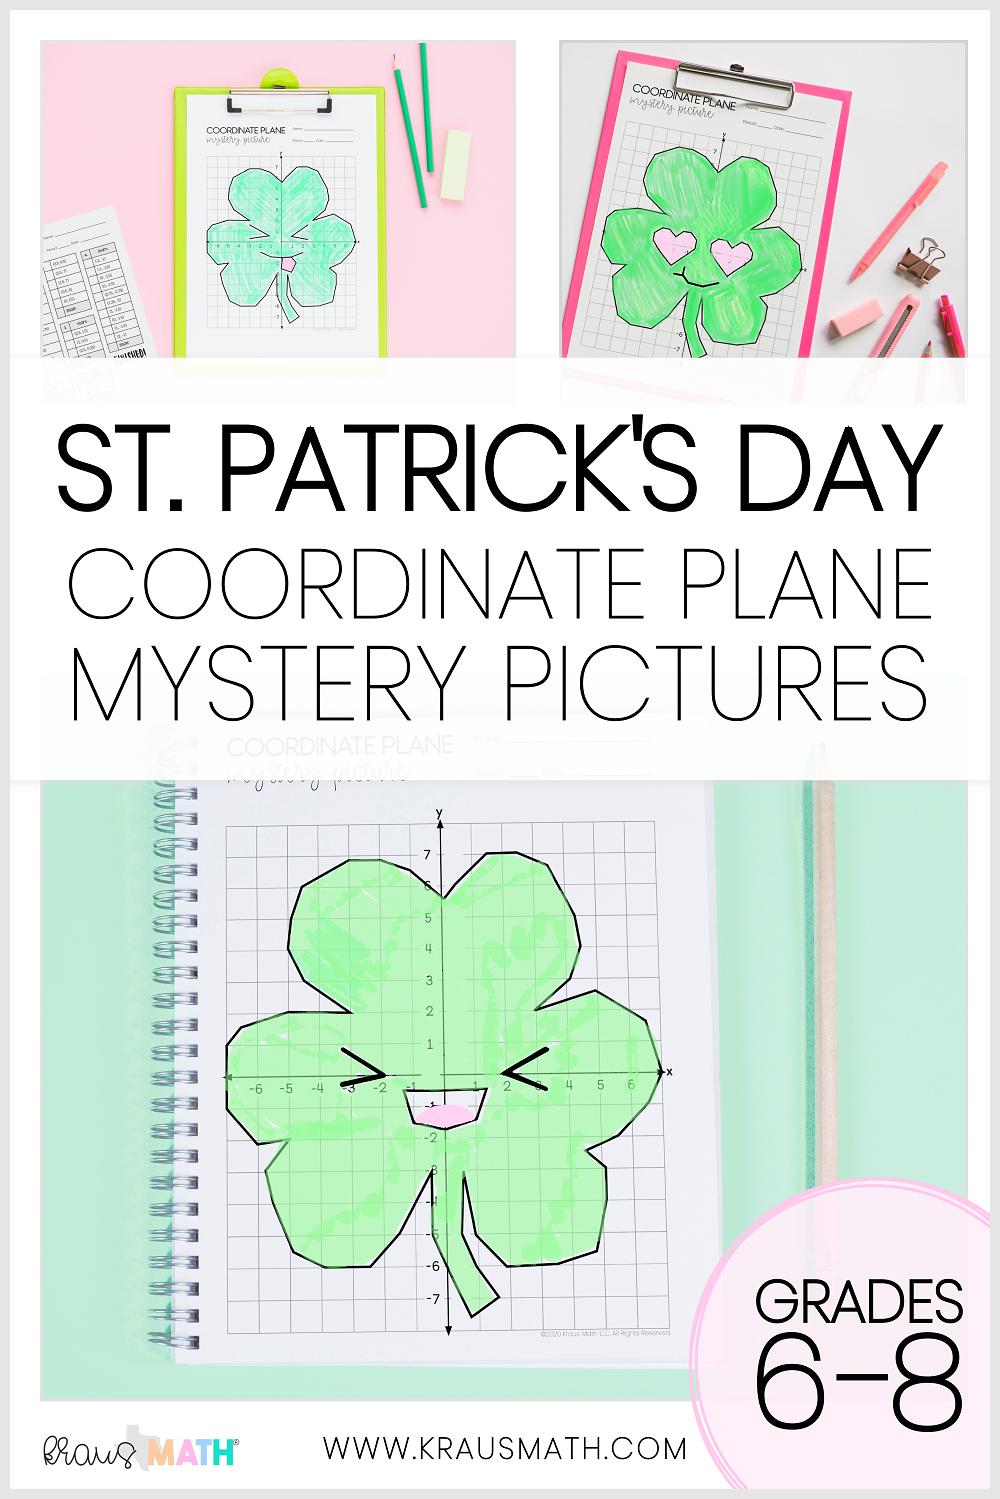 St Patrick S Day Coordinate Plane Mystery Picture Bundle 4 Quadrants Kraus Math Fun Math Activities Fun Math Mystery Pictures [ 1499 x 1000 Pixel ]